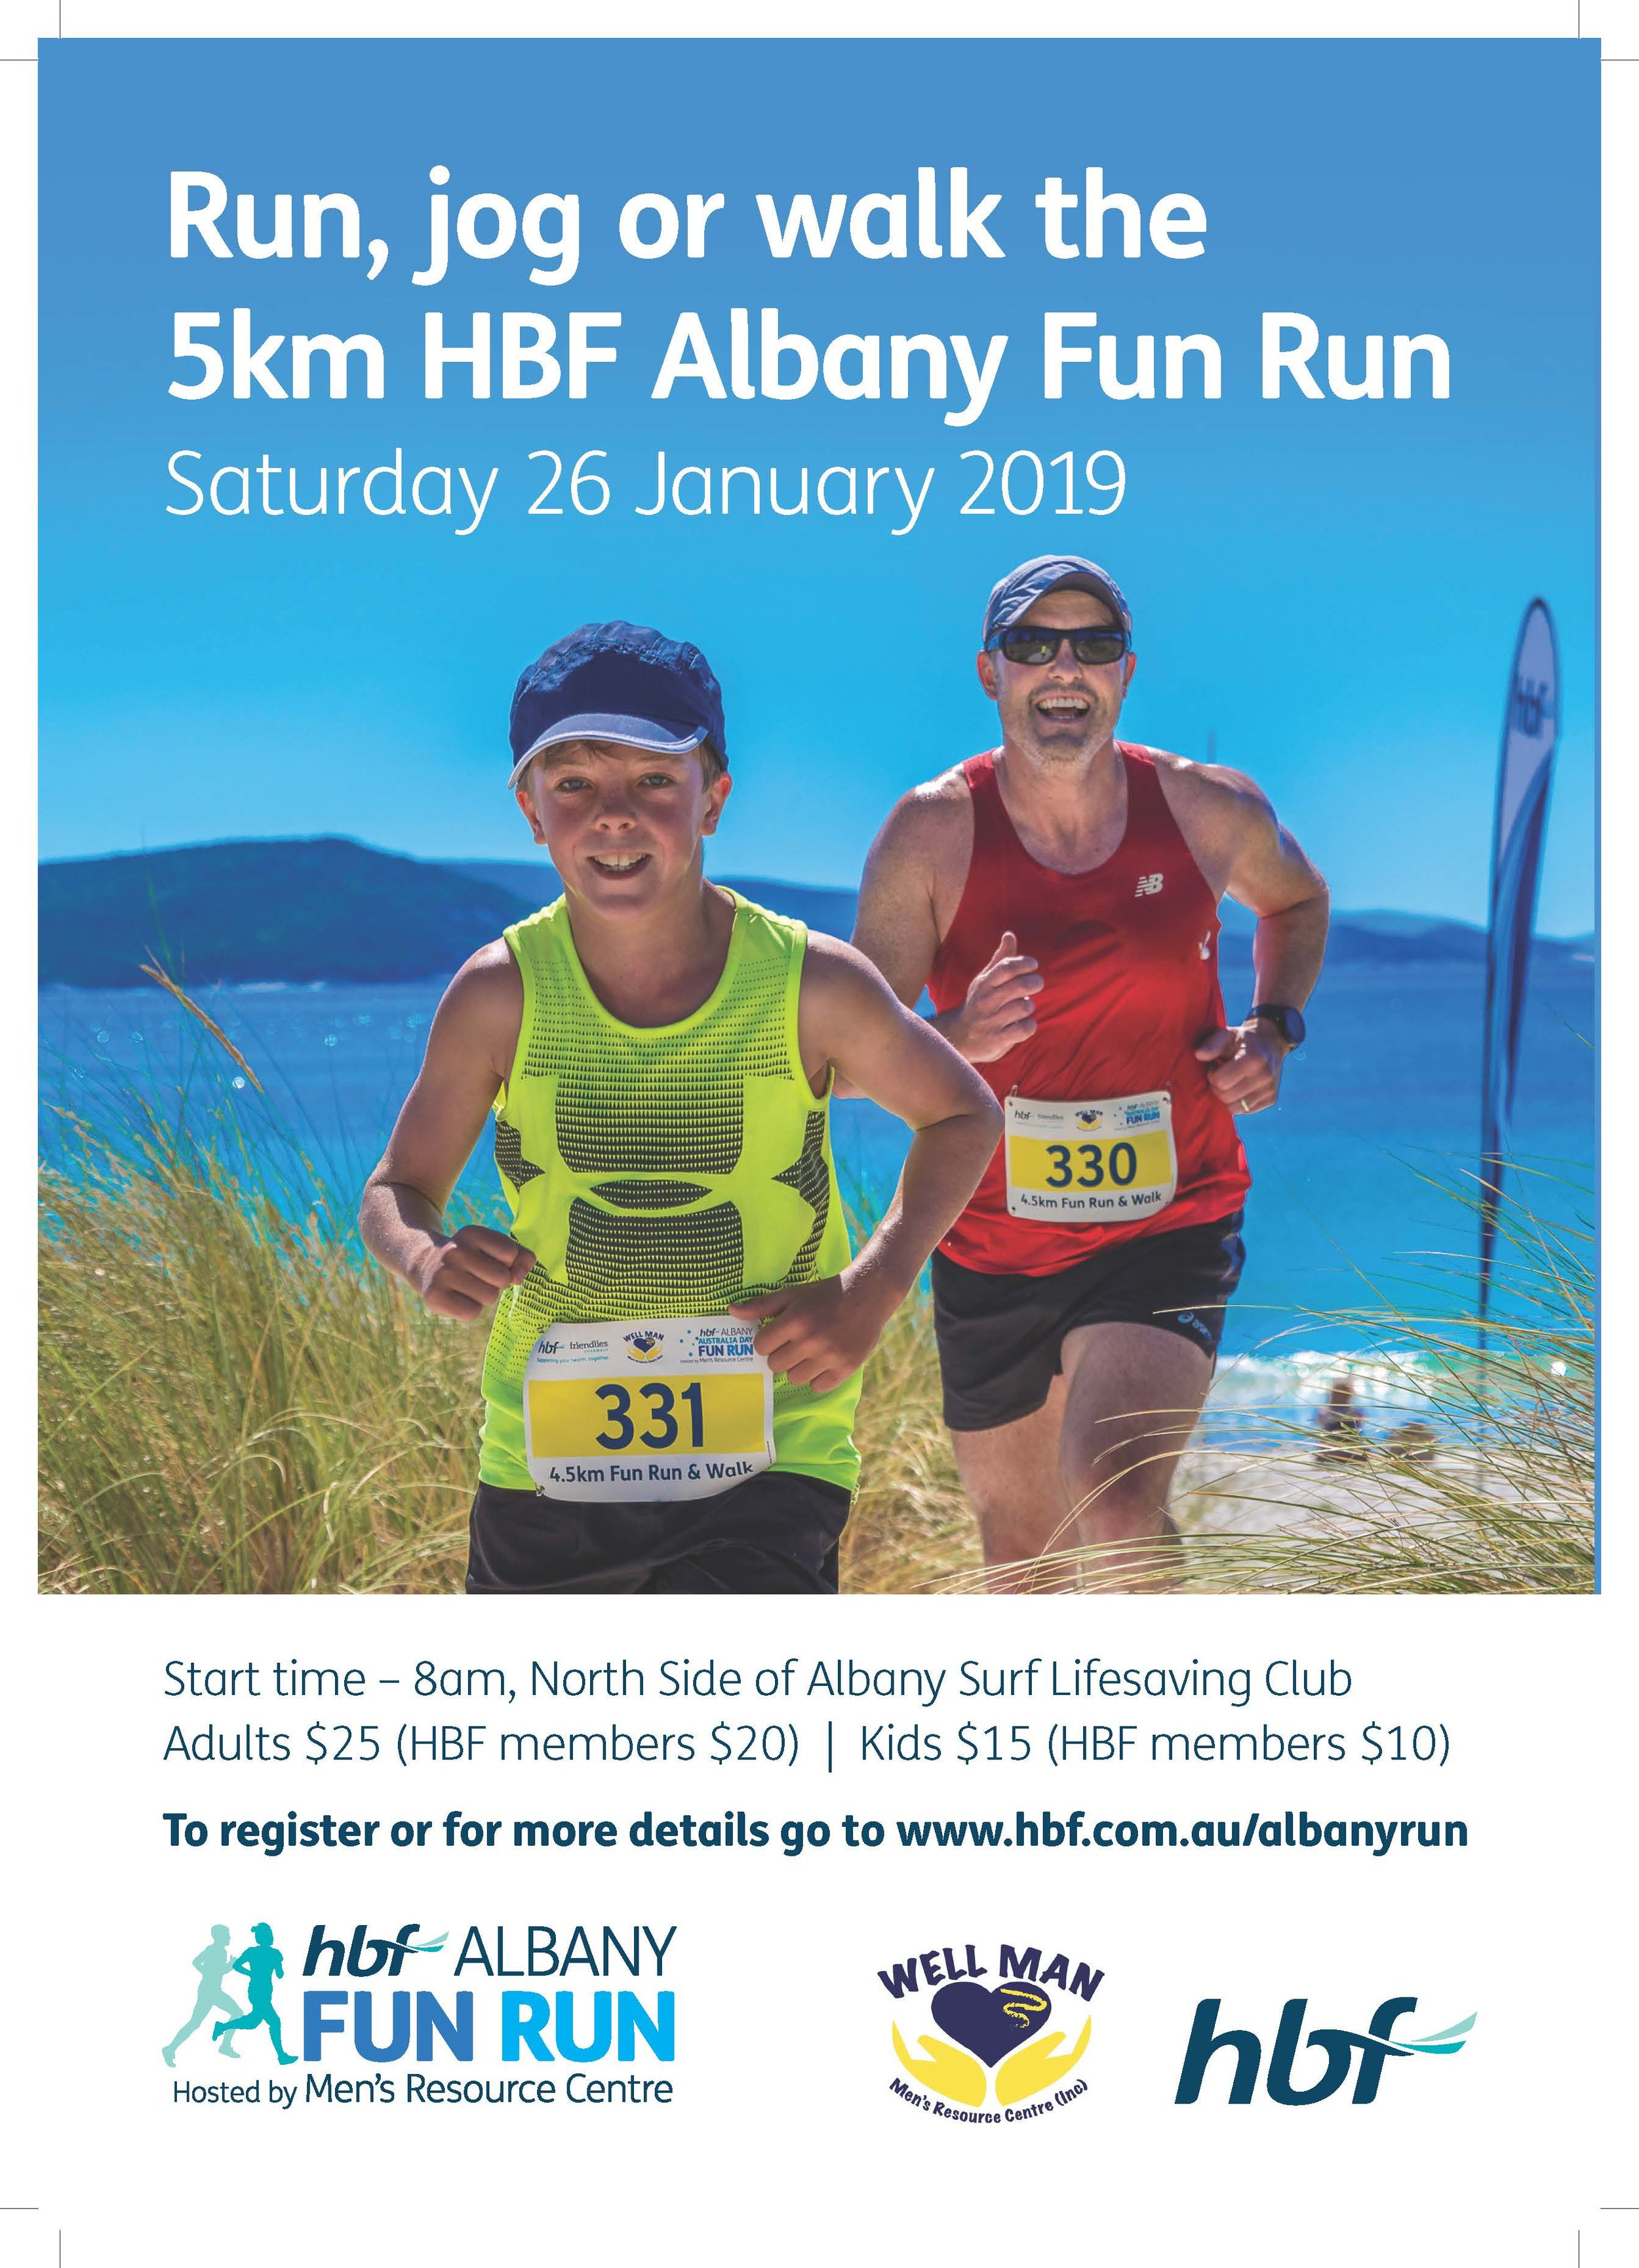 HBF14966 Albany AFR 2019 A4_P.jpg